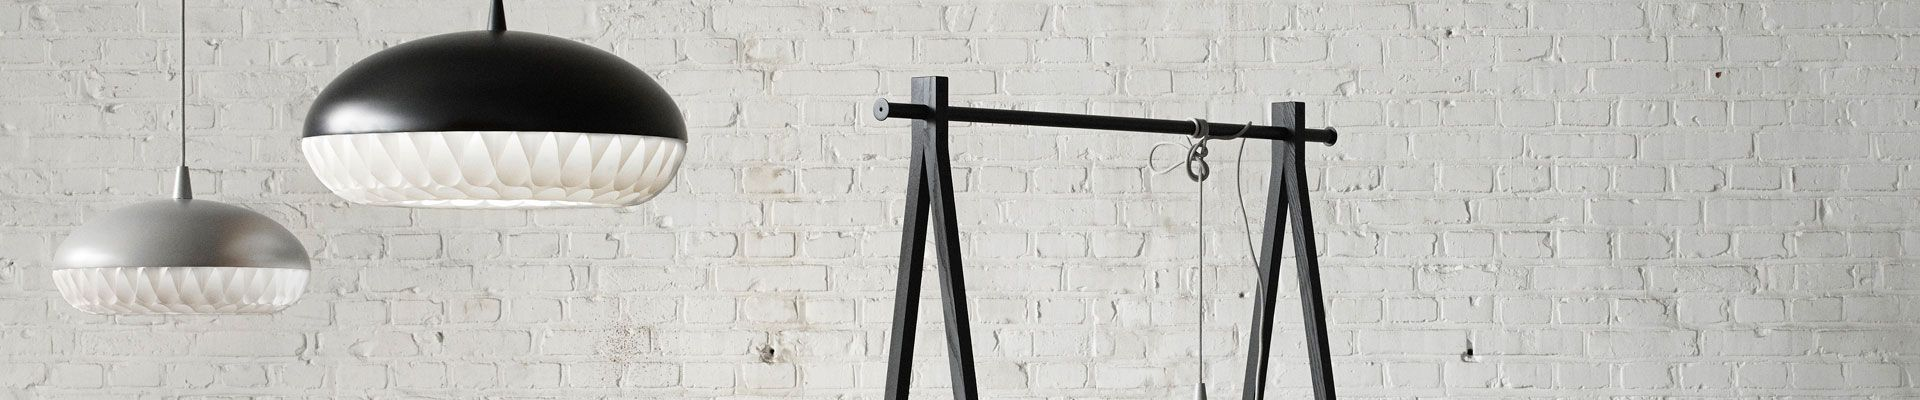 Lightyears hanglampen